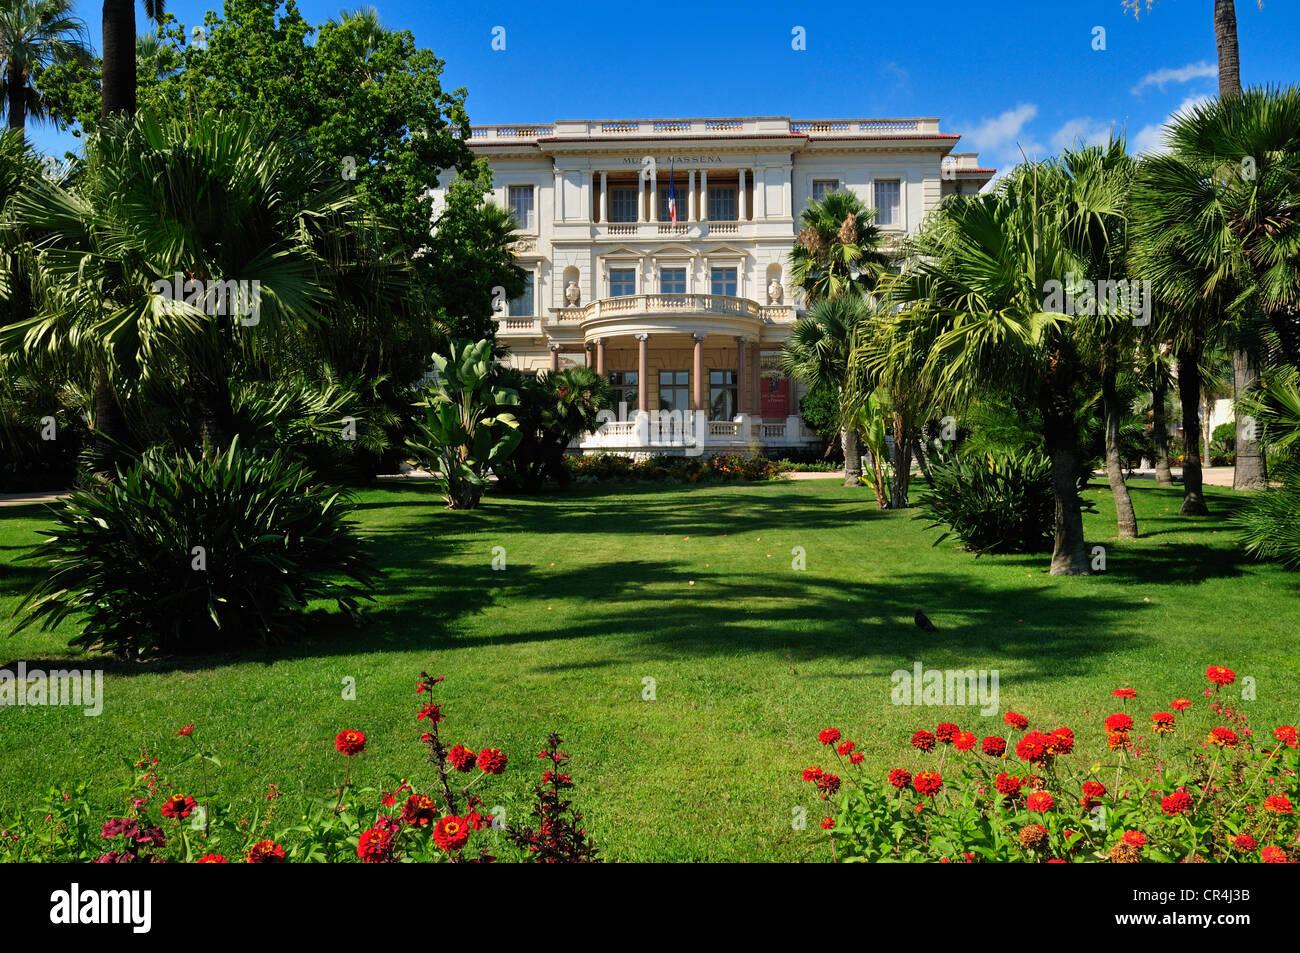 Museum, Musee Massena, Nice, Nizza, Cote d'Azur, Alpes Maritimes, Provence, France, Europe - Stock Image